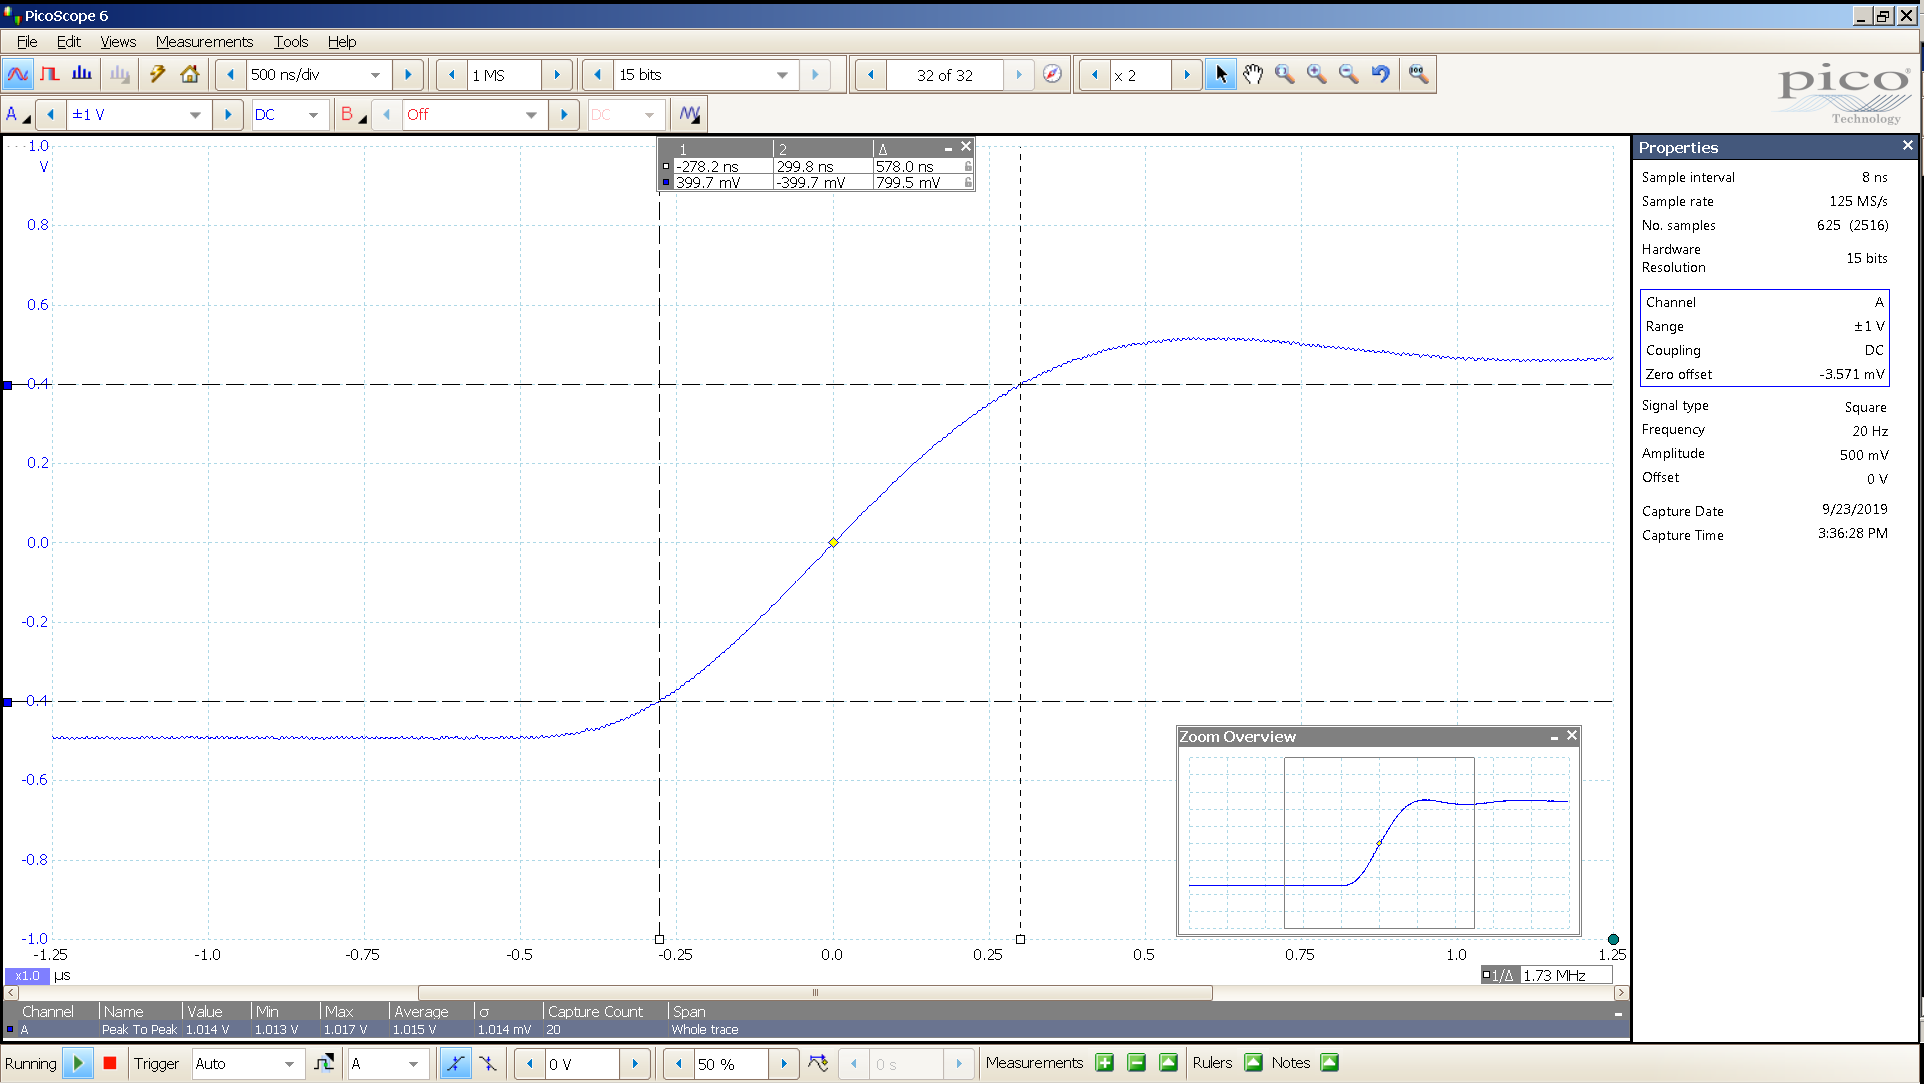 20190923 SigGen LiqGoldX 20 Hz square 1000mVpp 500nS div 20MHz filter 30R SE - BW calc.png